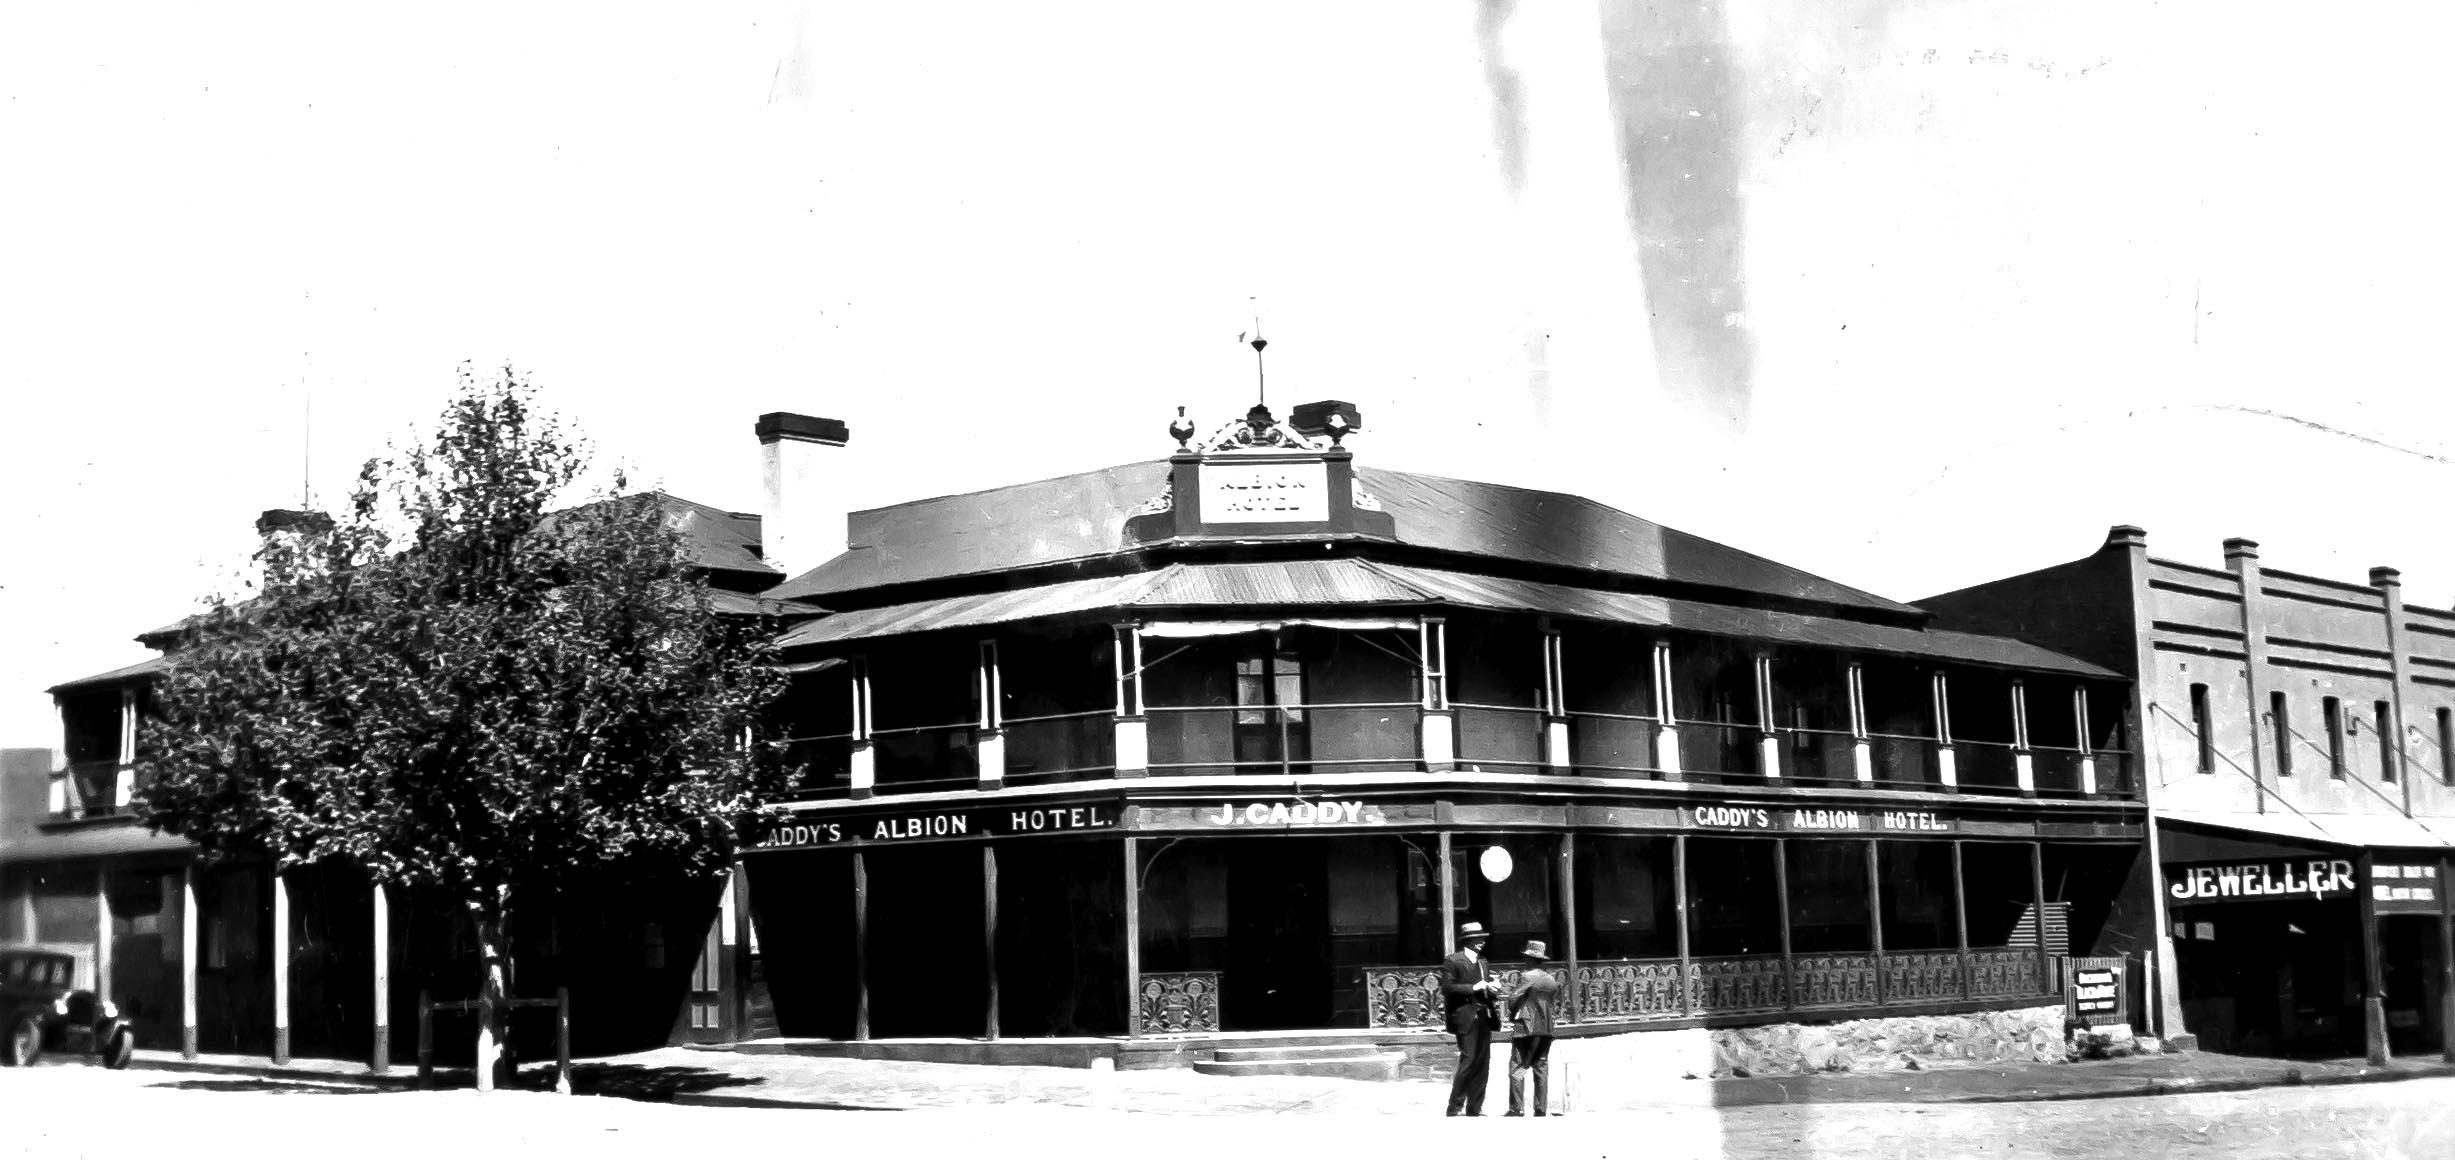 Albion Hotel, Braidwood